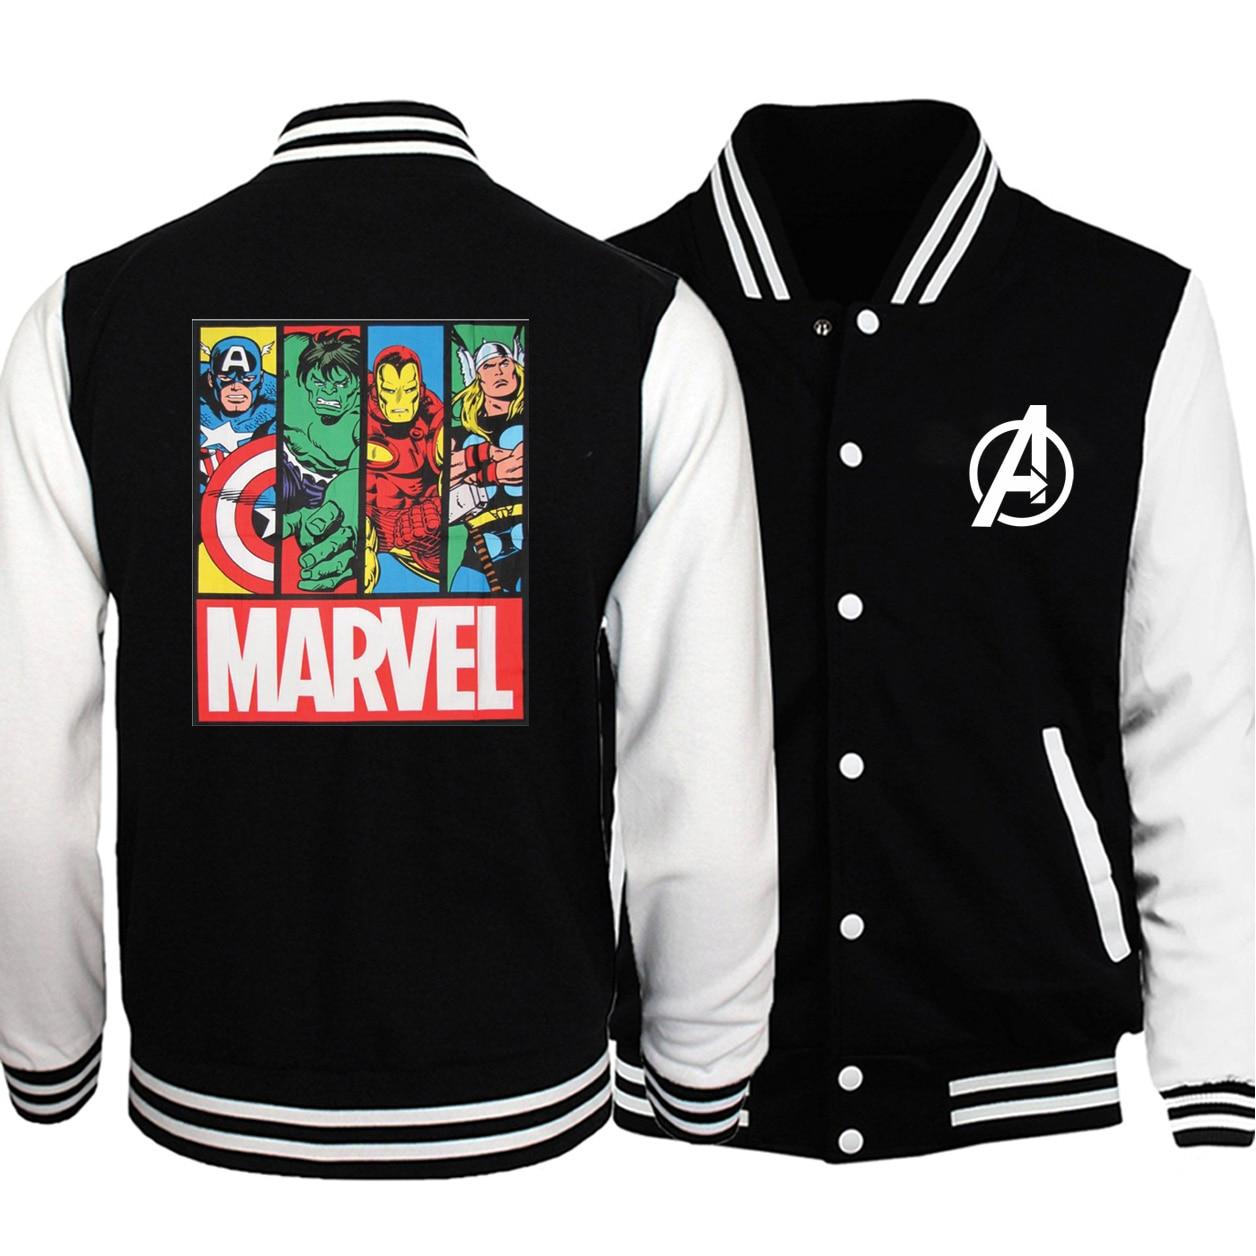 Thor Hulk Superman Iron Man Superhero Baseball Men Jackets Coats Baseball uniform Autumn Fleece White Black Bomber Streetwear